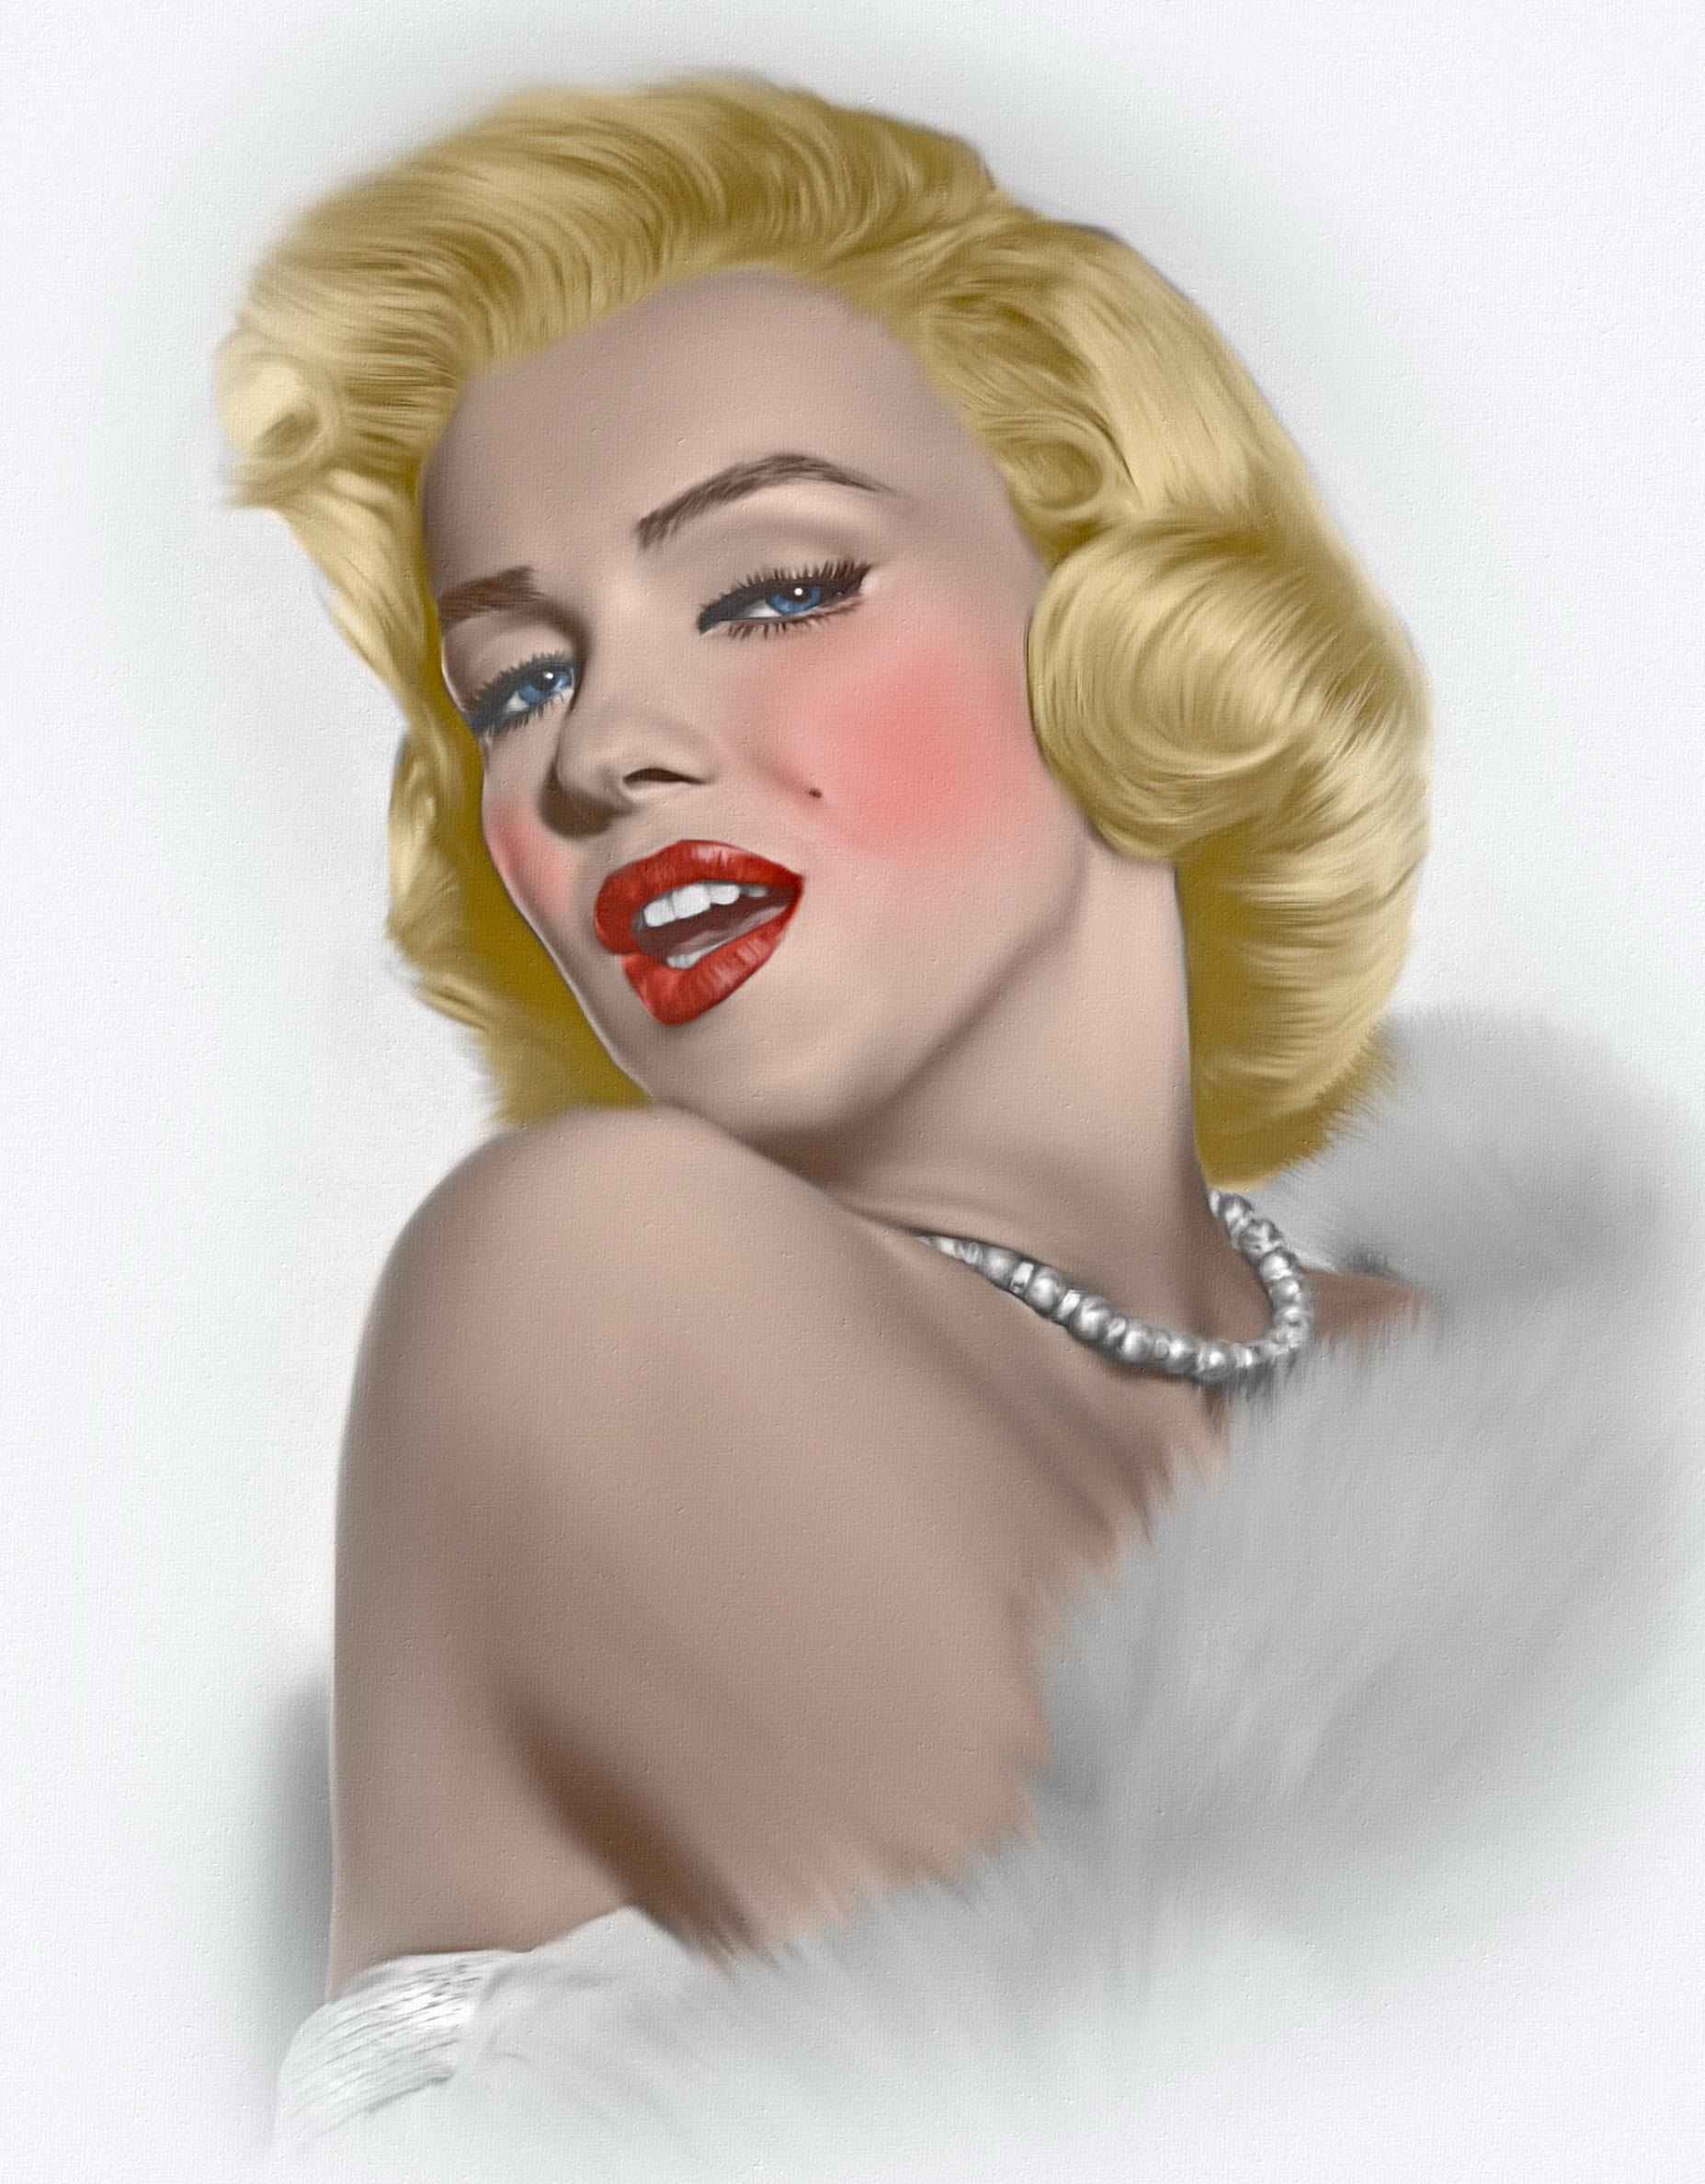 Image Marilyn Monroe Blonde Girl Young Woman Celebrities 1855x2376